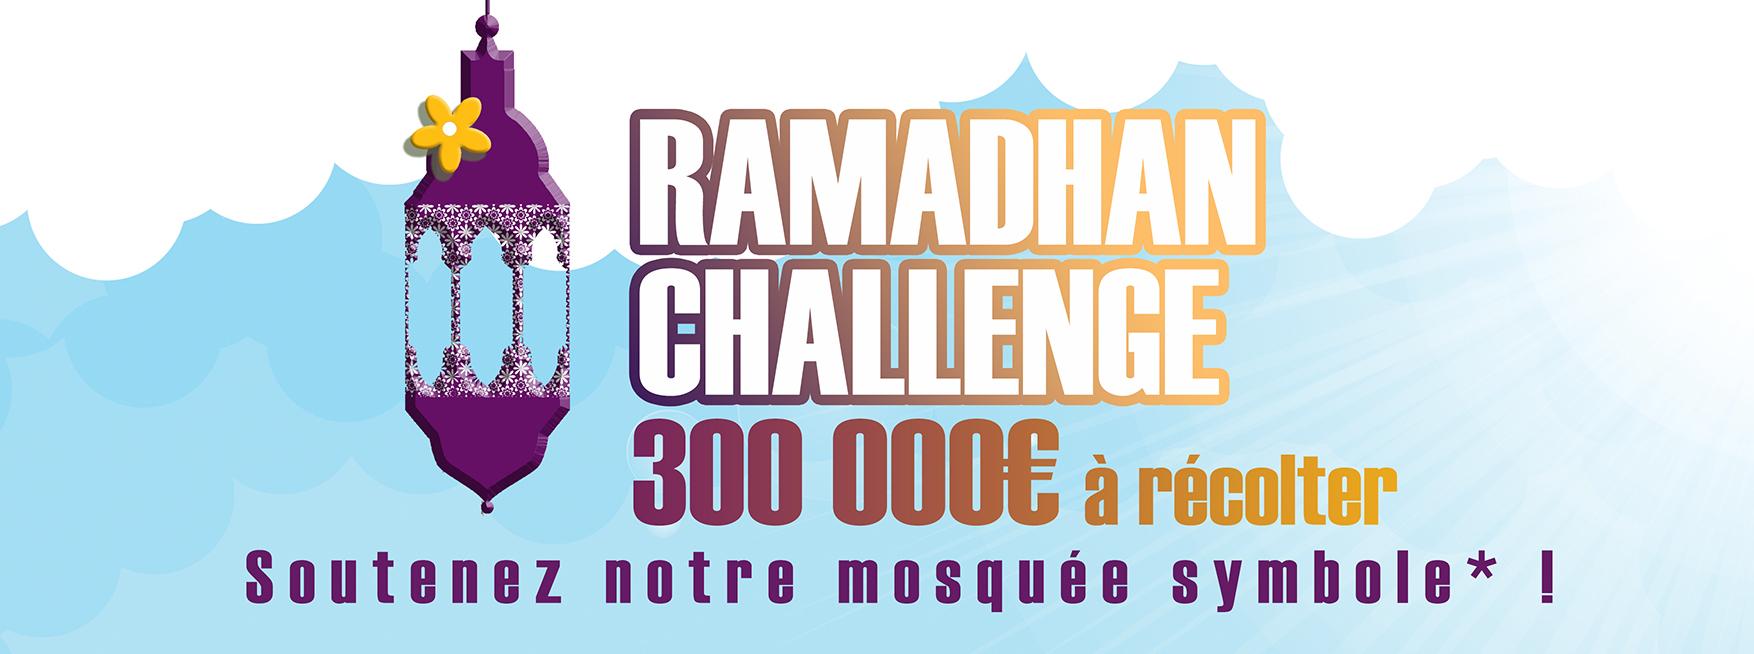 AFFICHE RAMADAN CHALLENGE Mosquée Mantes Sud